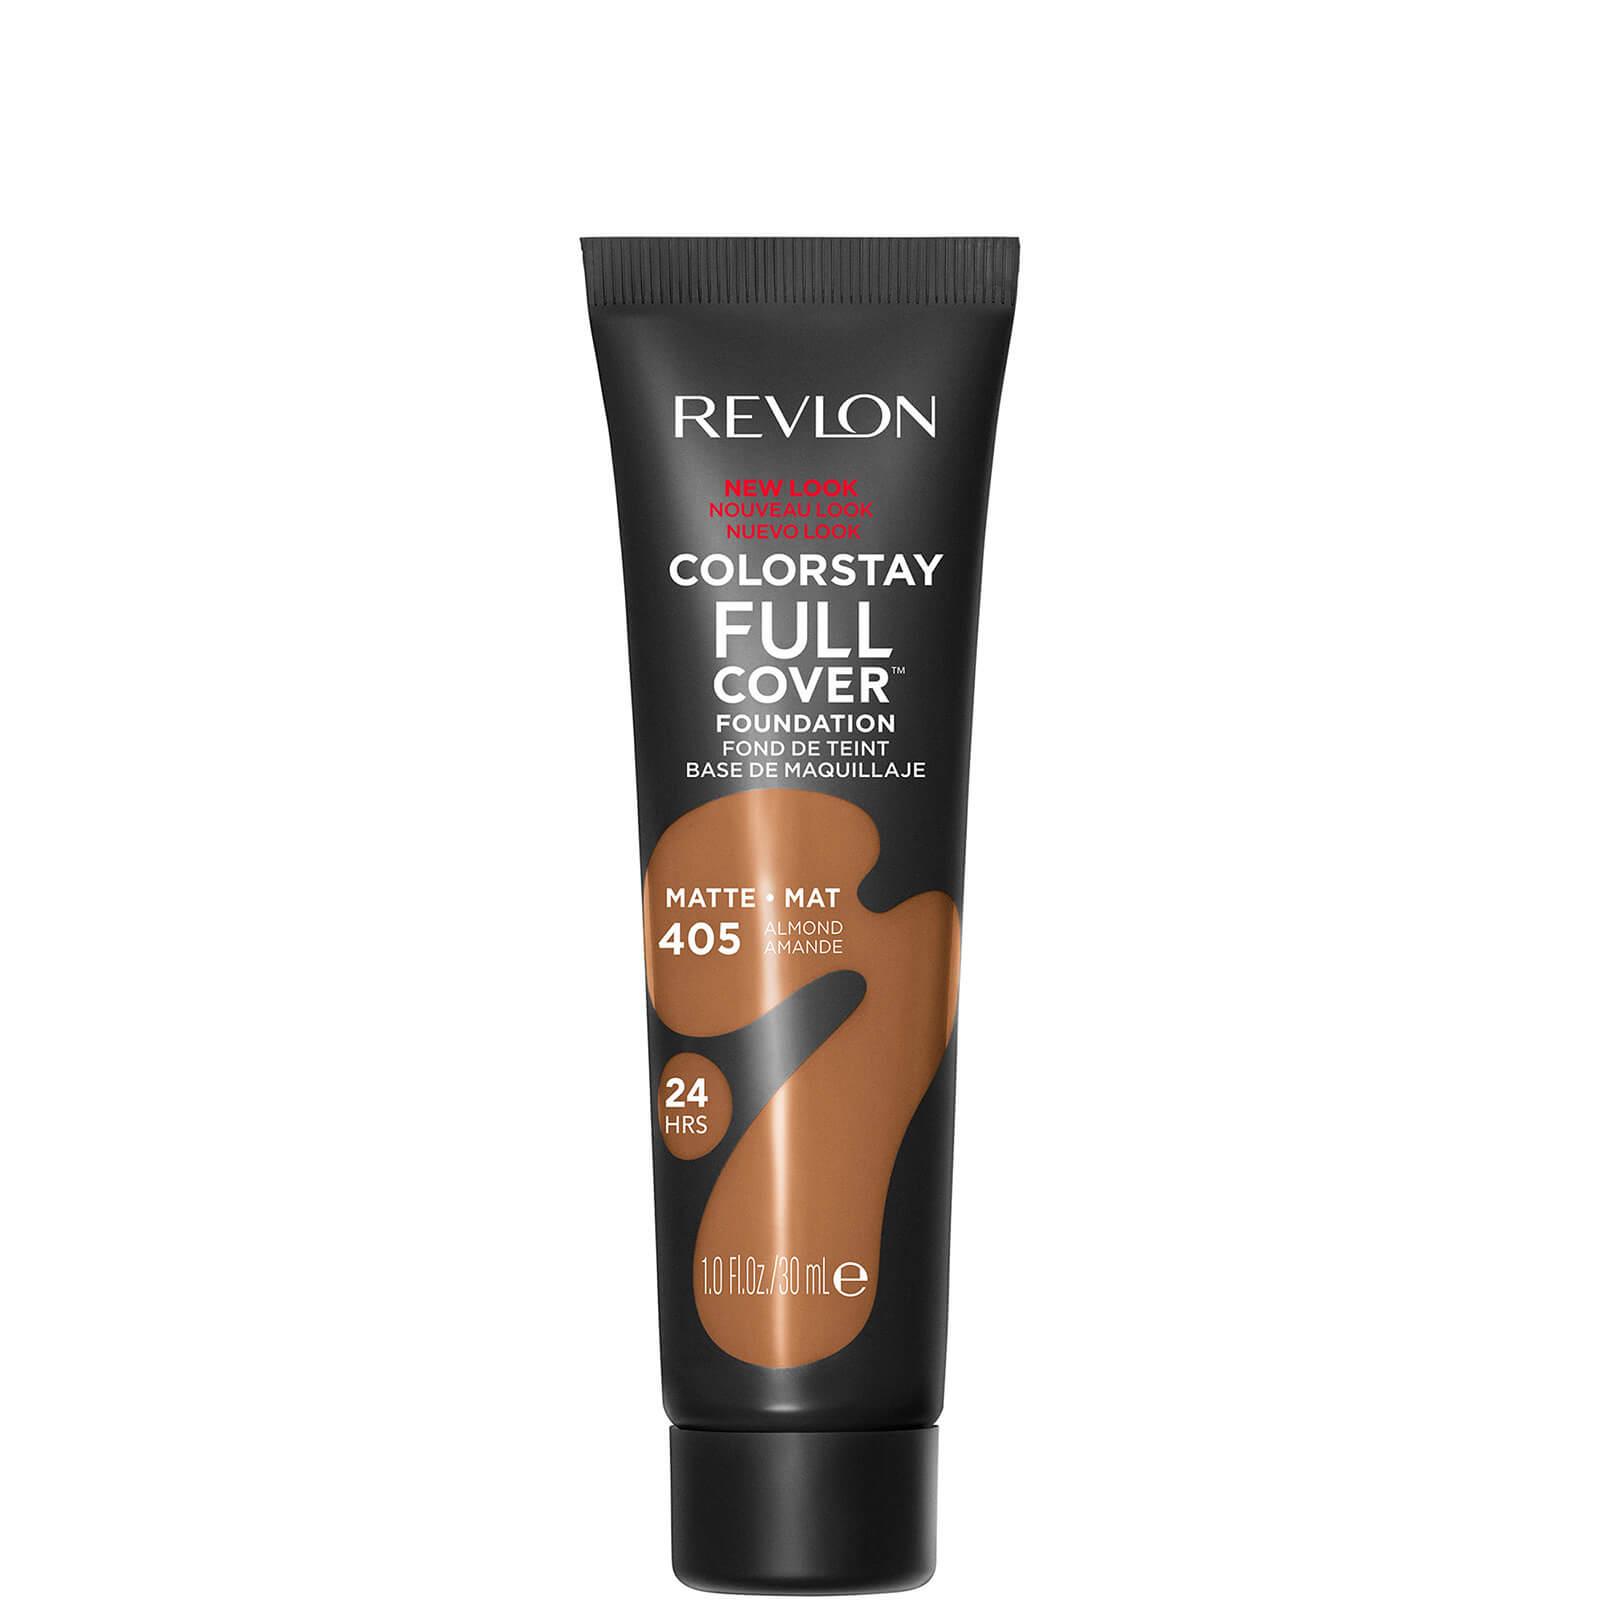 Купить Revlon Colorstay Full Cover Foundation 31g (Various Shades) - Almond